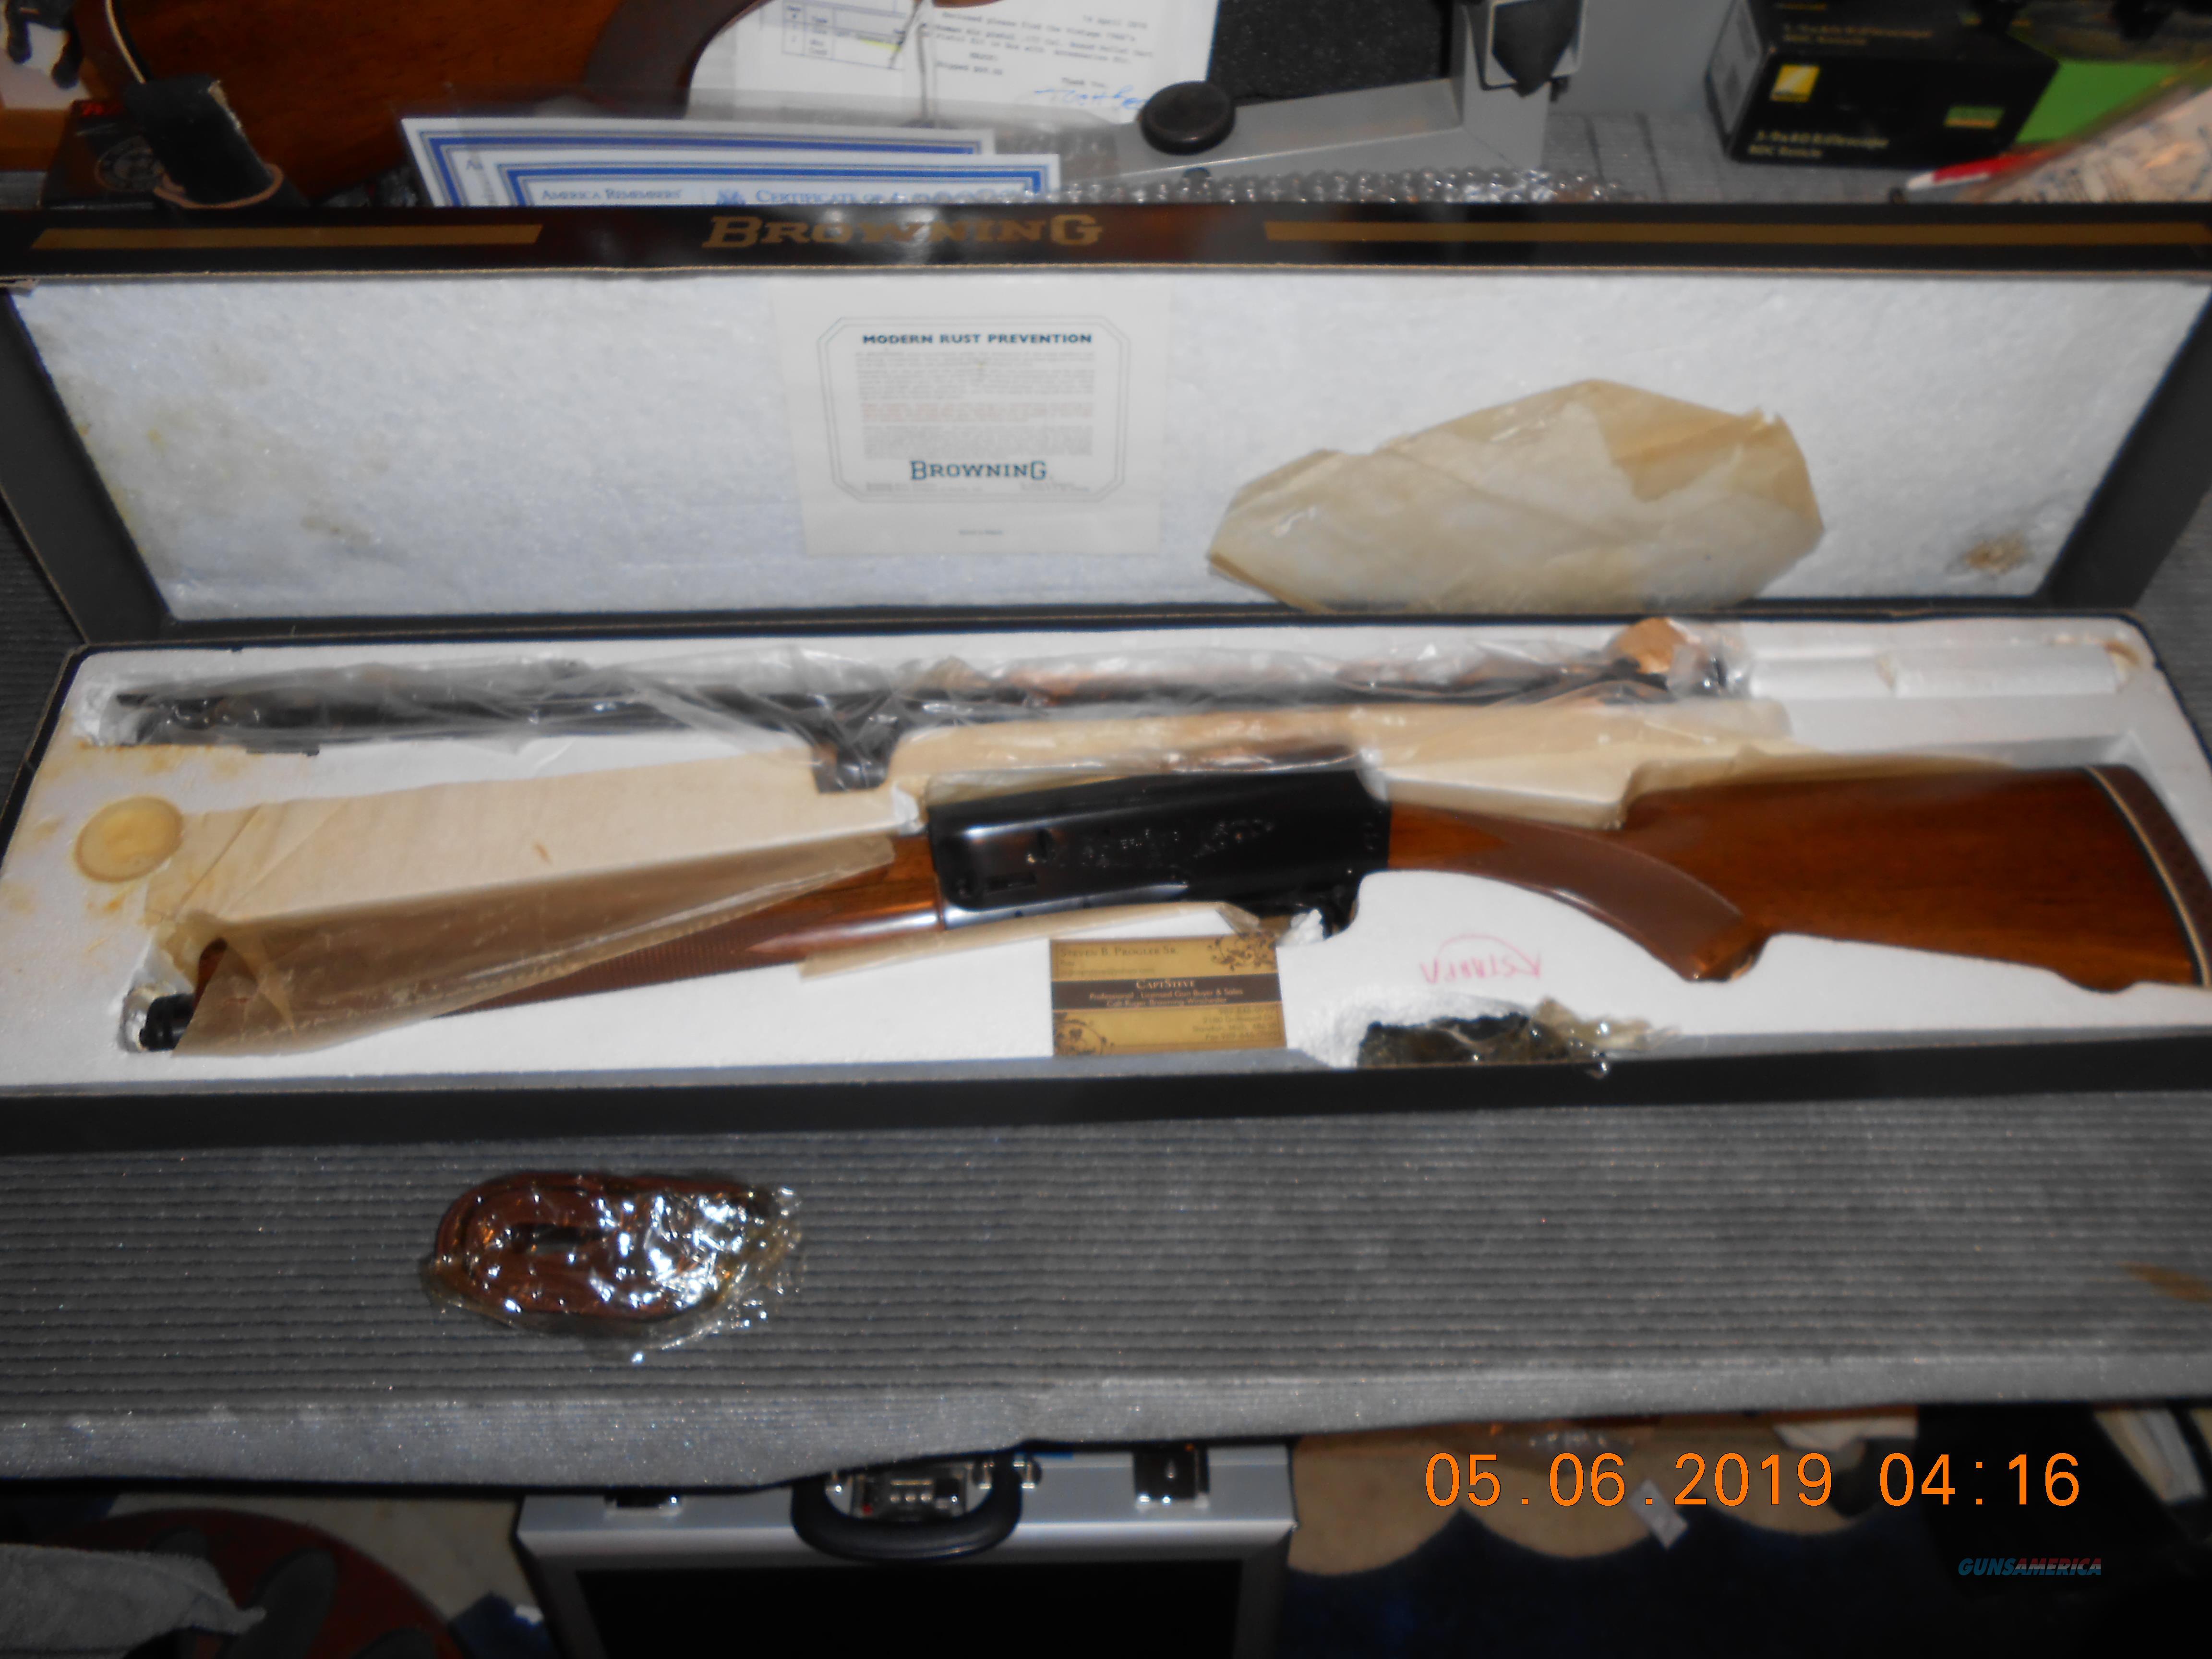 NOS Belgium Browning A5 Big Game  12 Magnum SCARCE  Guns > Shotguns > Browning Shotguns > Autoloaders > Hunting